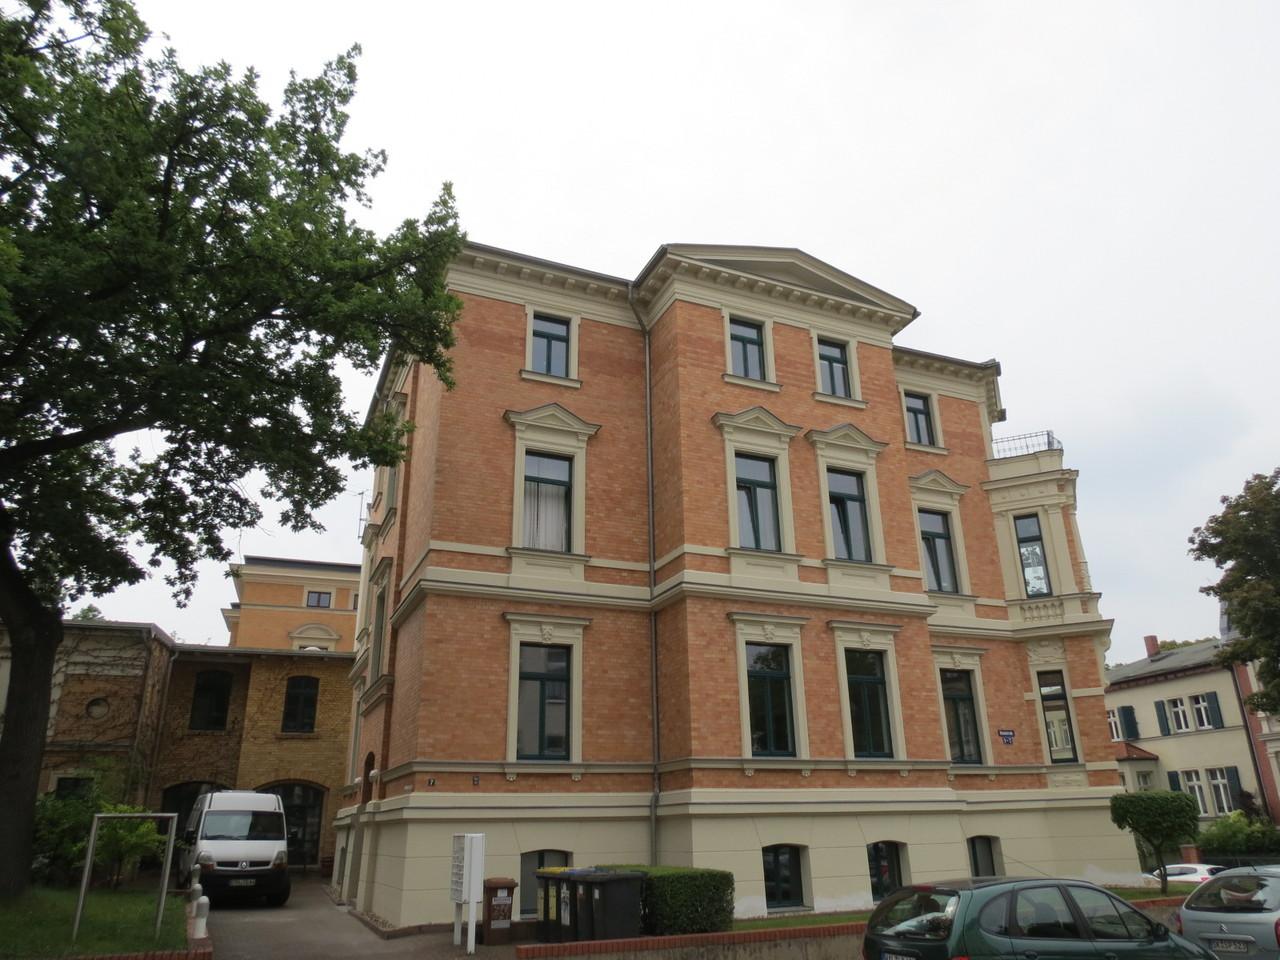 Händelstraße Halle Stuckfassade